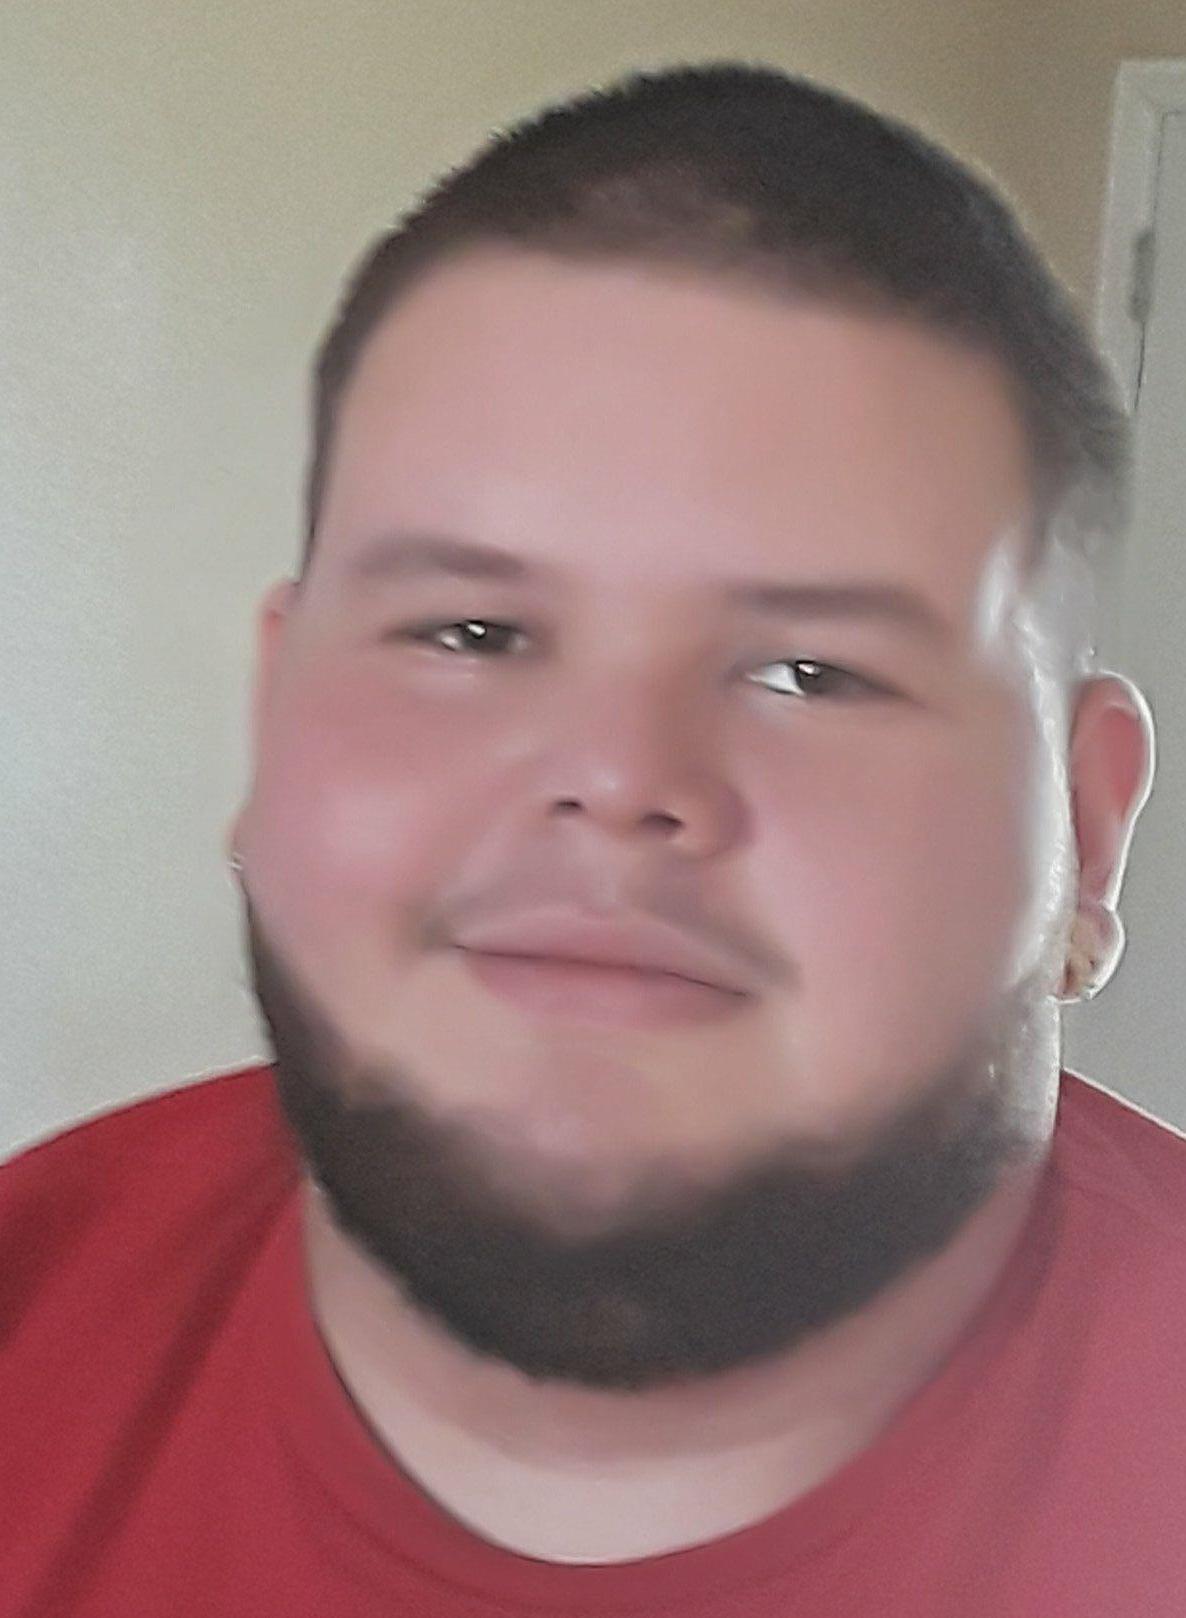 Andrew Martin Jimenez Age 19